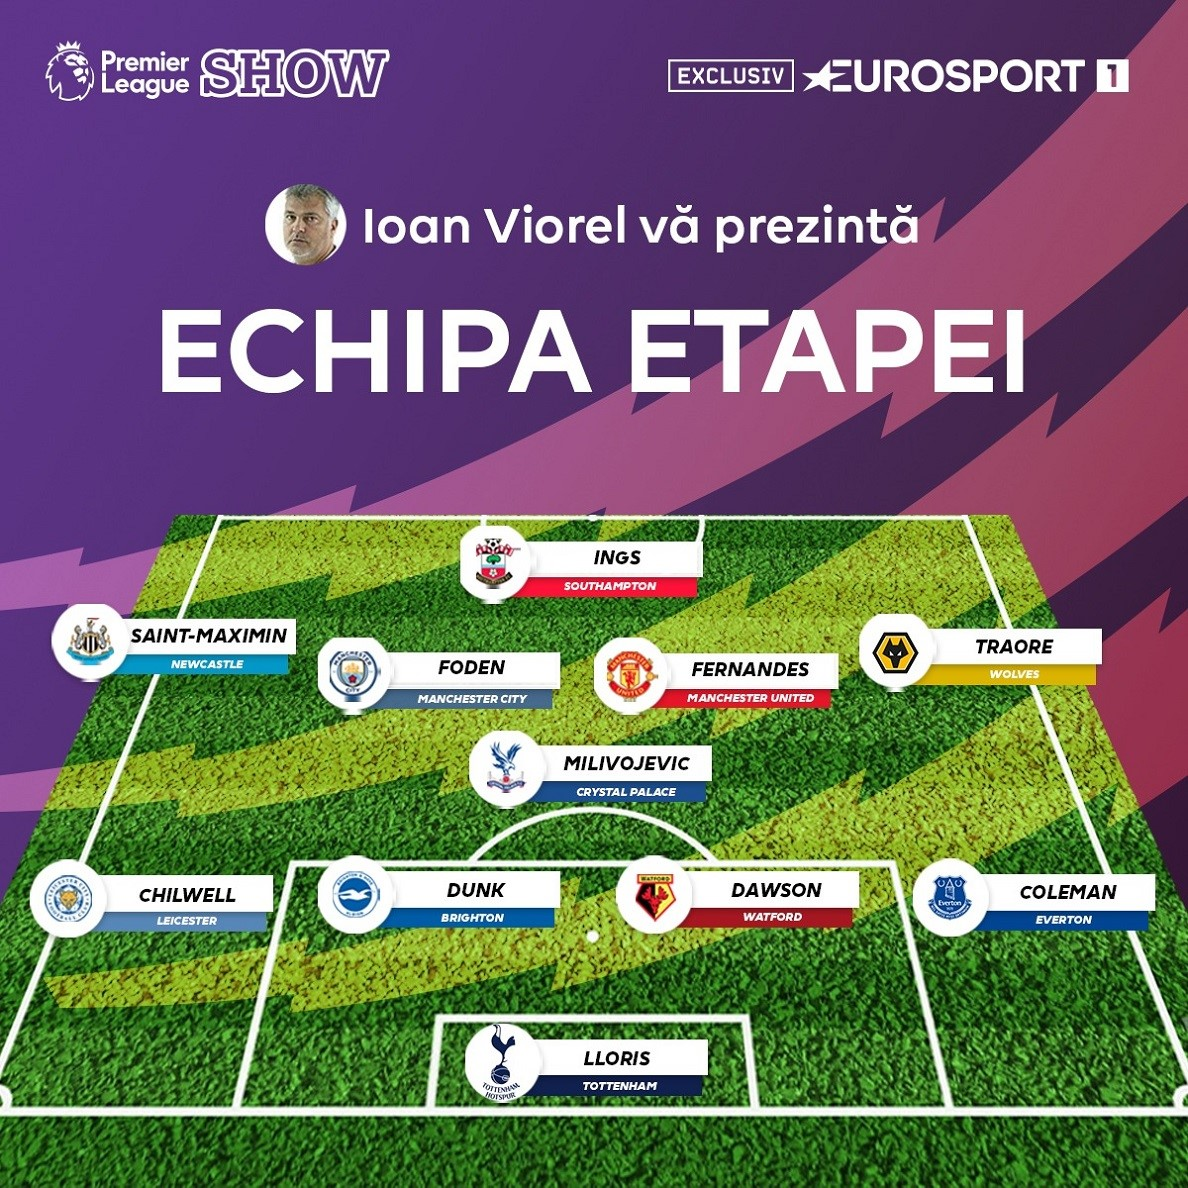 https://i.eurosport.com/2020/06/23/2837701.jpg